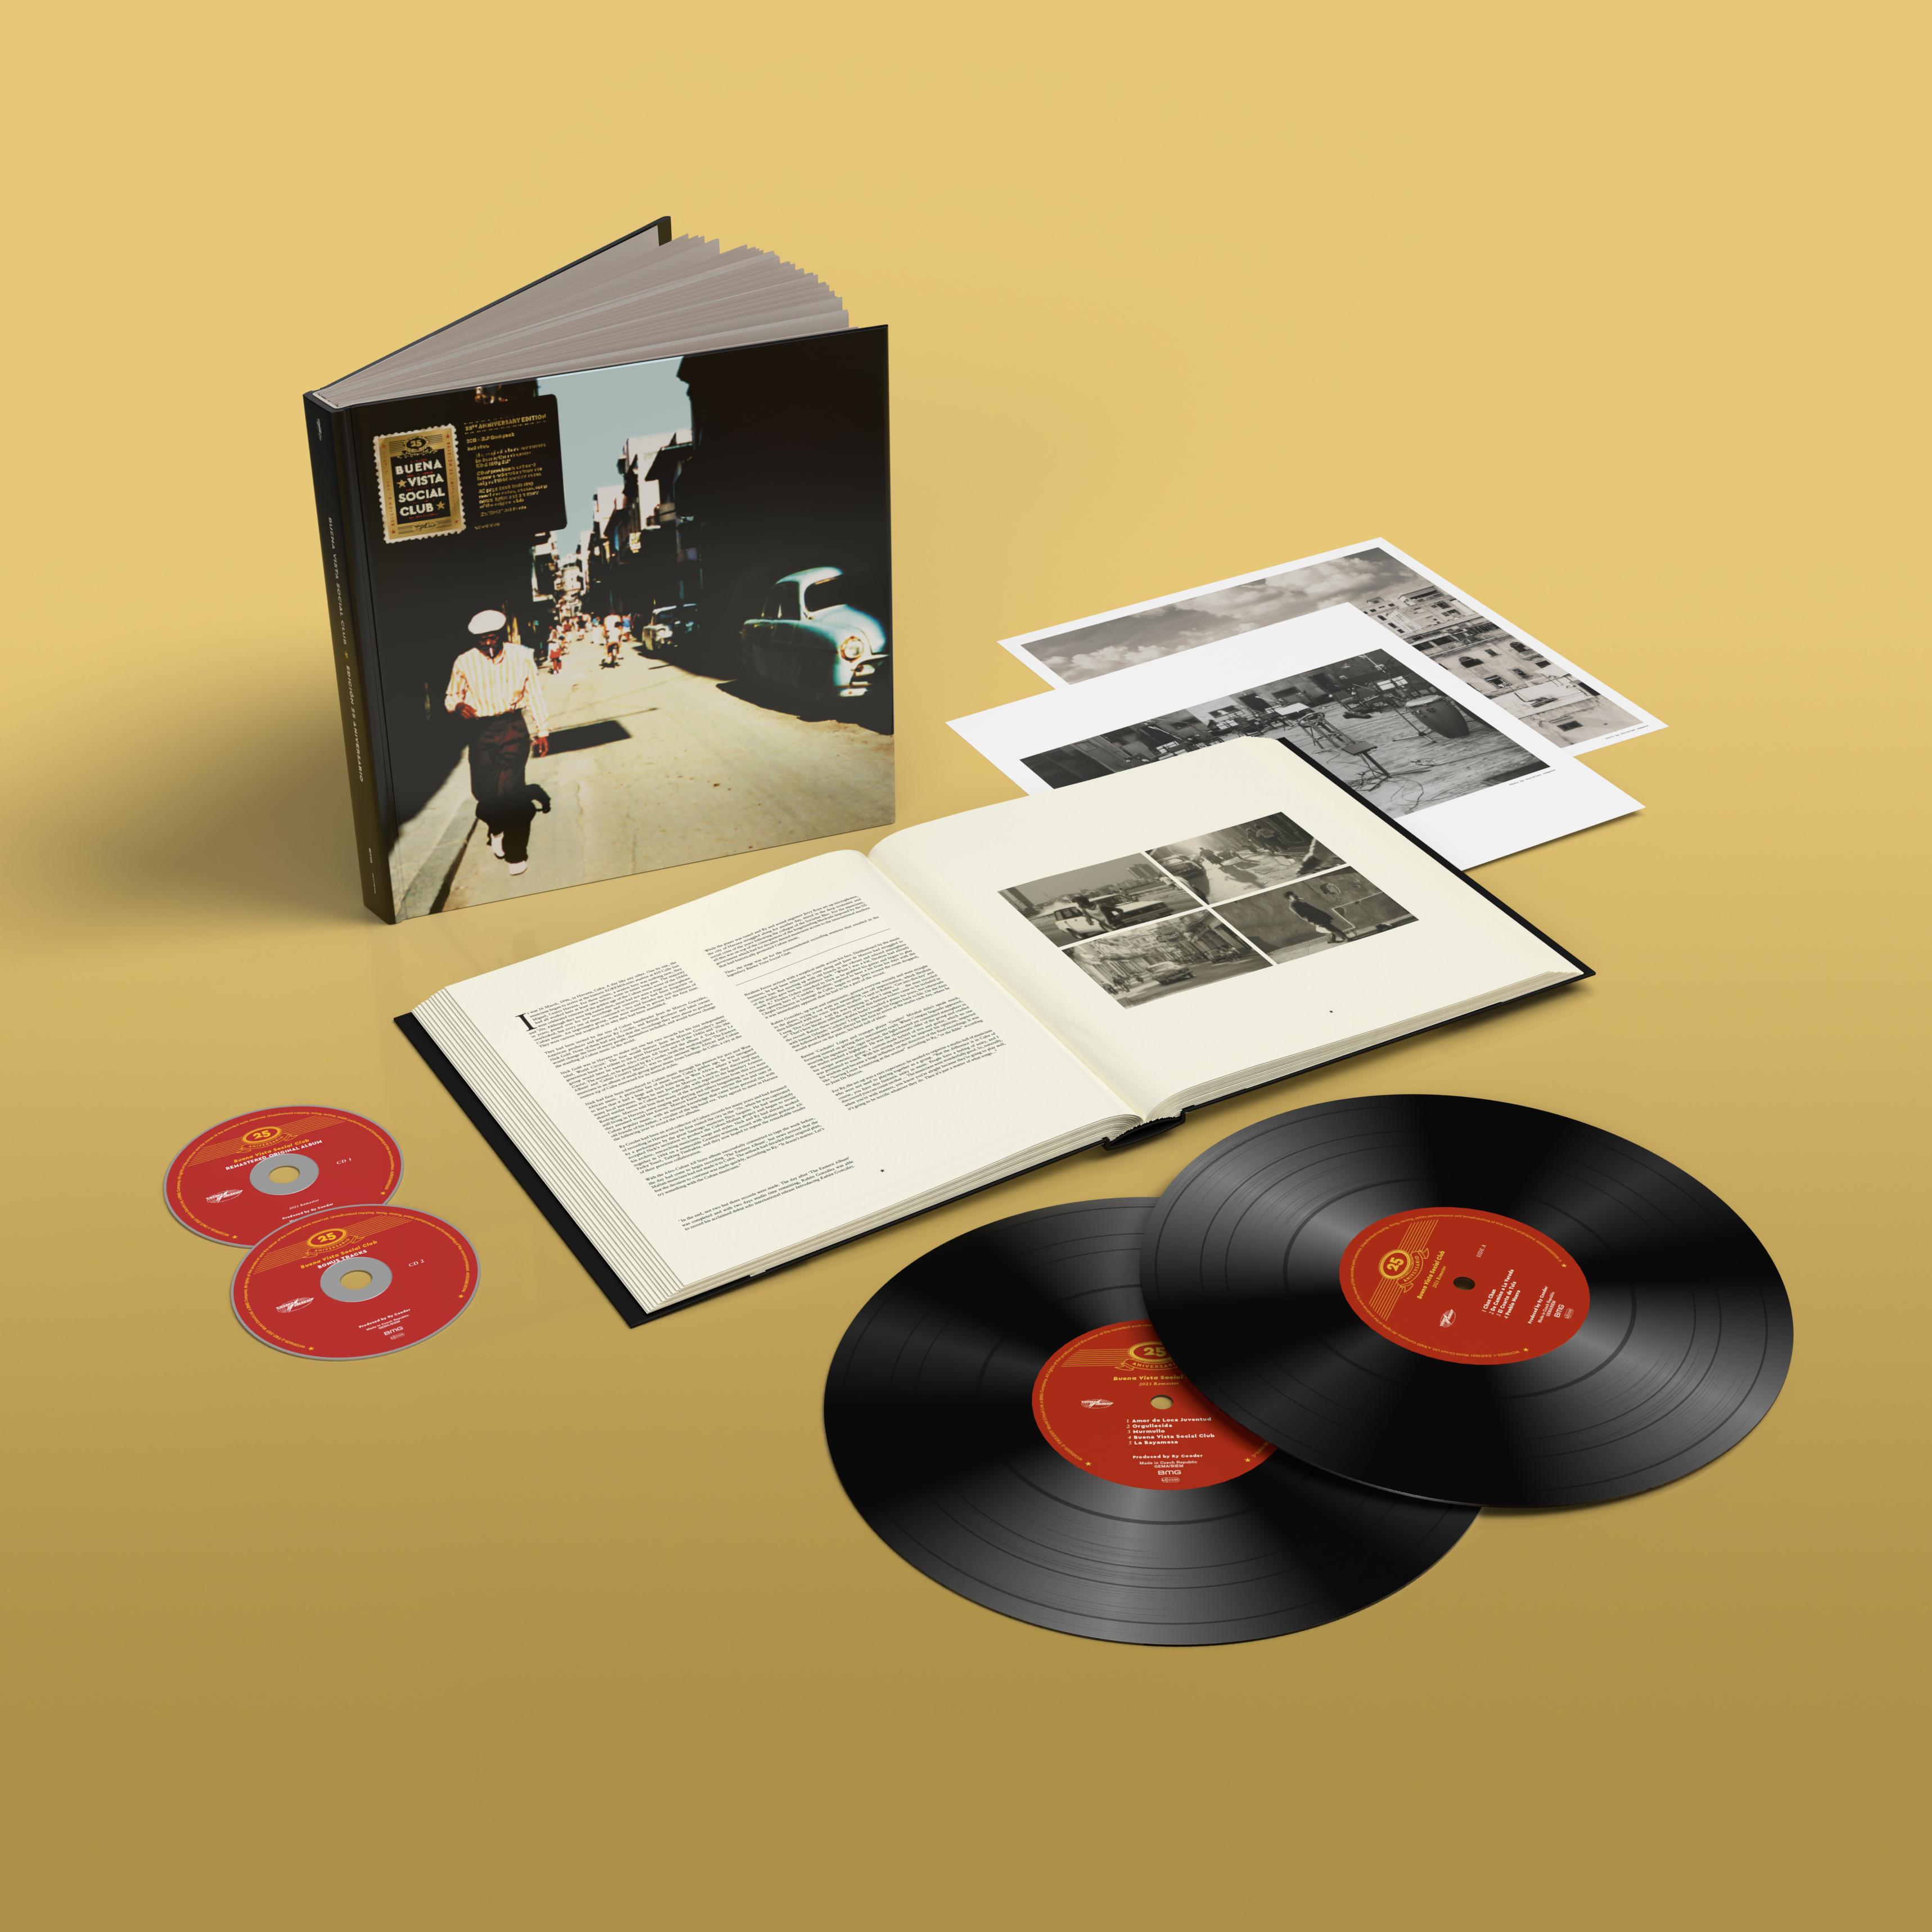 Buy Online Buena Vista Social Club - 25th Anniversary Edition 2LP + 2CD Deluxe Bookpack